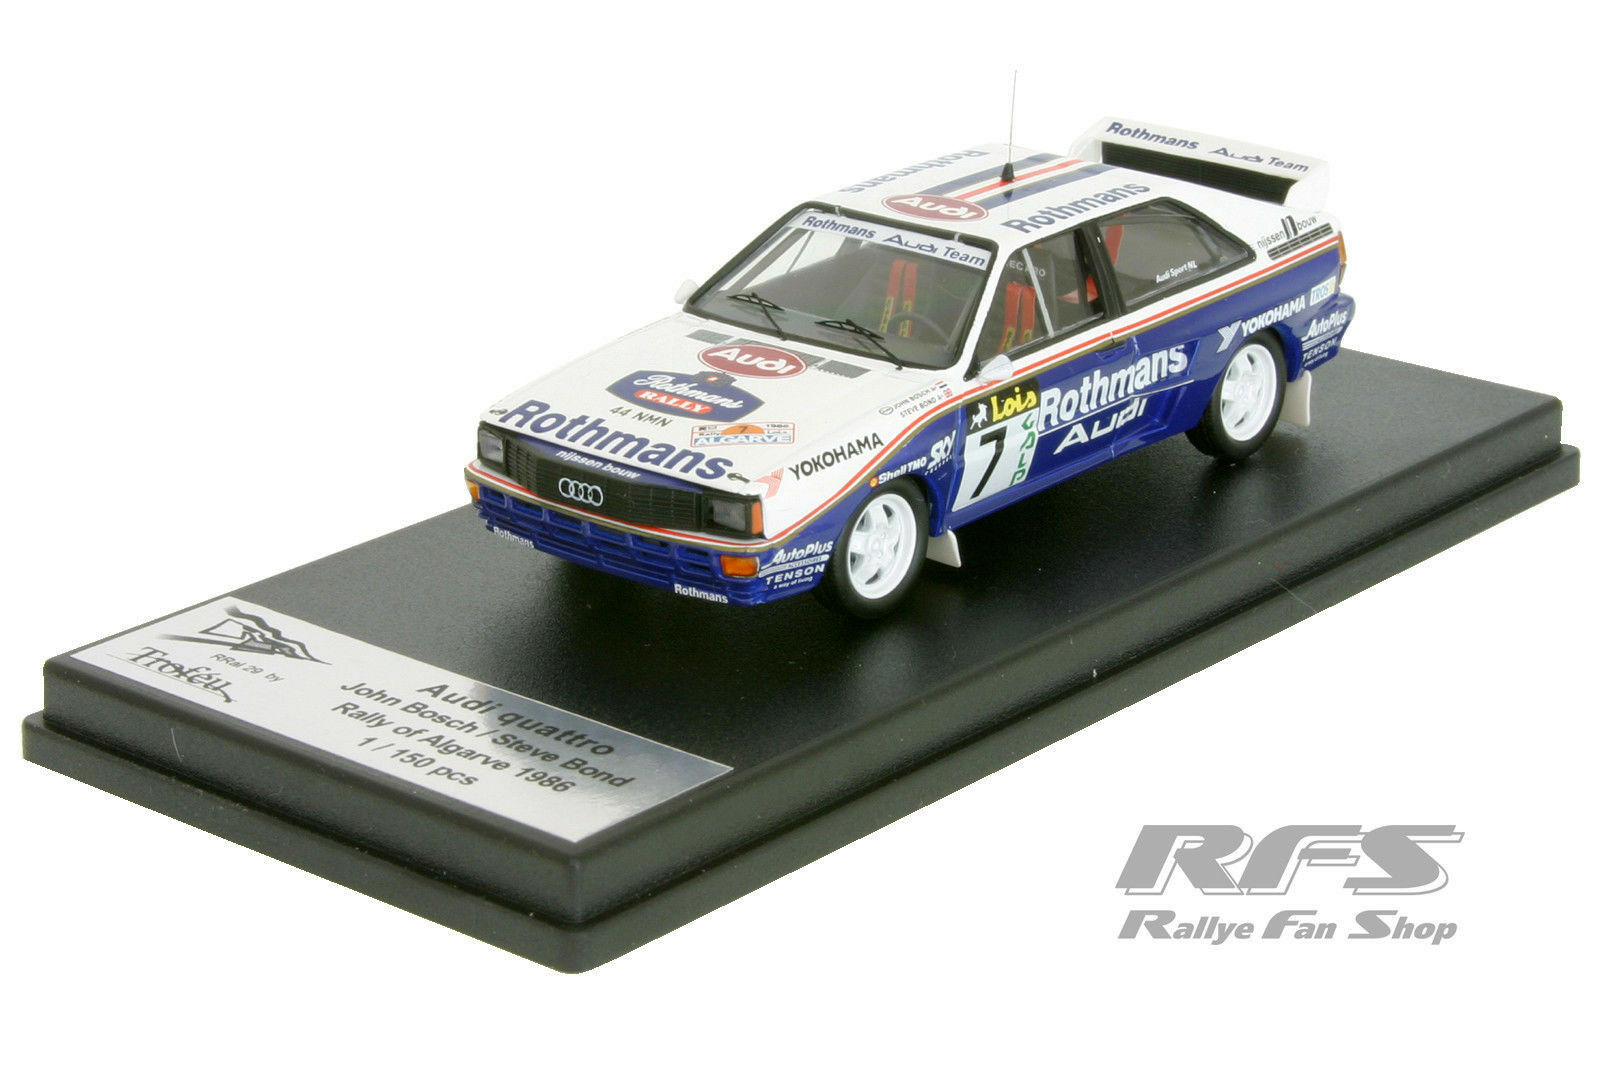 AUDI Quattro a2-Team rossohmans-rally Algarve 1986 - 1 43 Trofeu RRAL 029mr